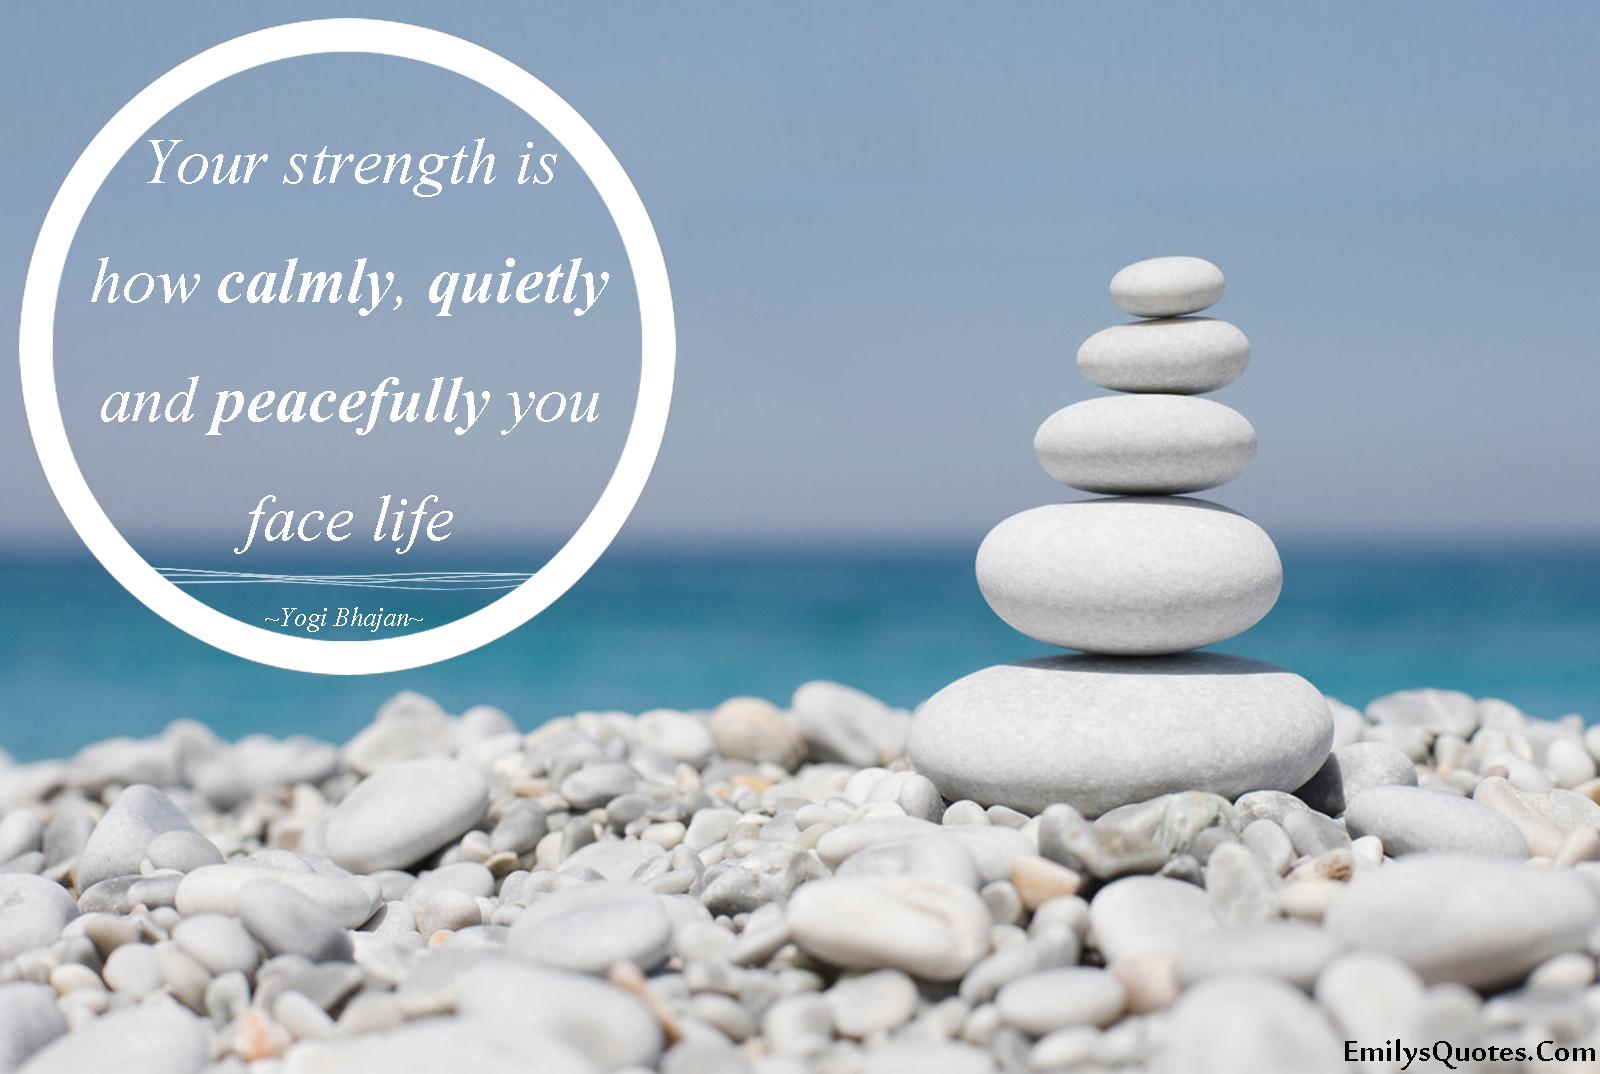 EmilysQuotes.Com - strength, calm, quiet, peaceful, life, relationship, amazing, great, wisdom, Yogi Bhajan